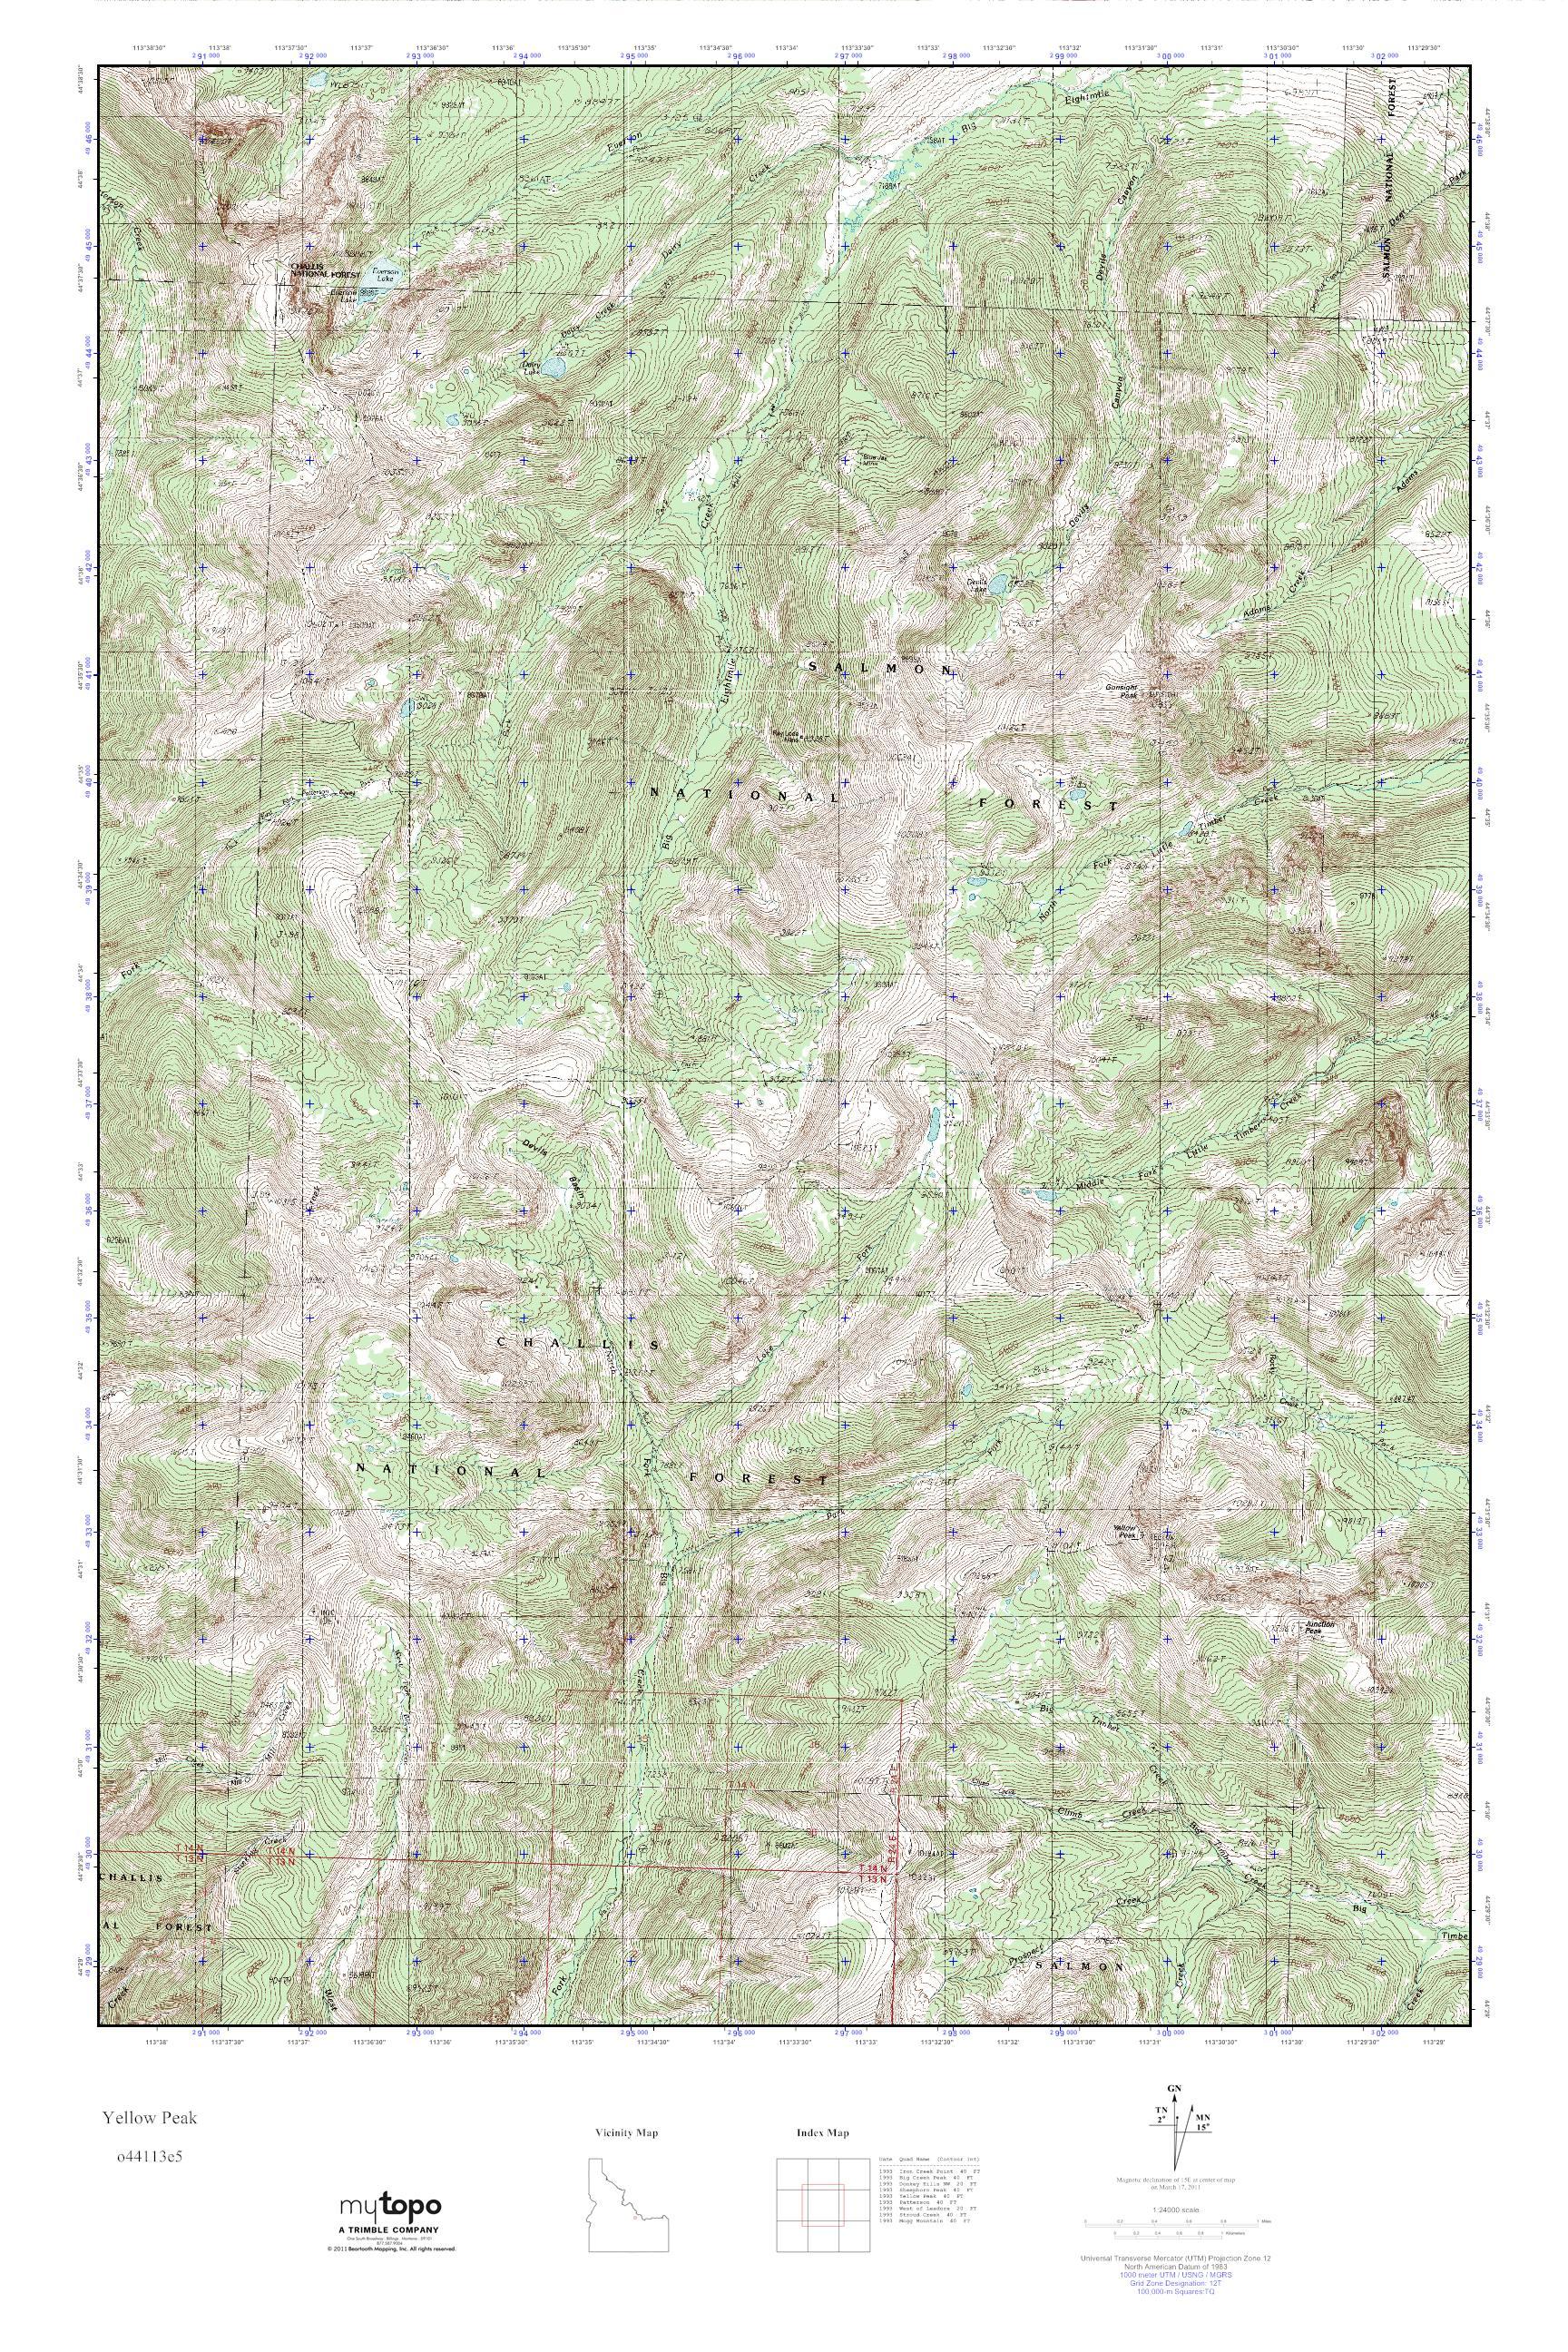 MyTopo Yellow Peak, Idaho USGS Quad Topo Map